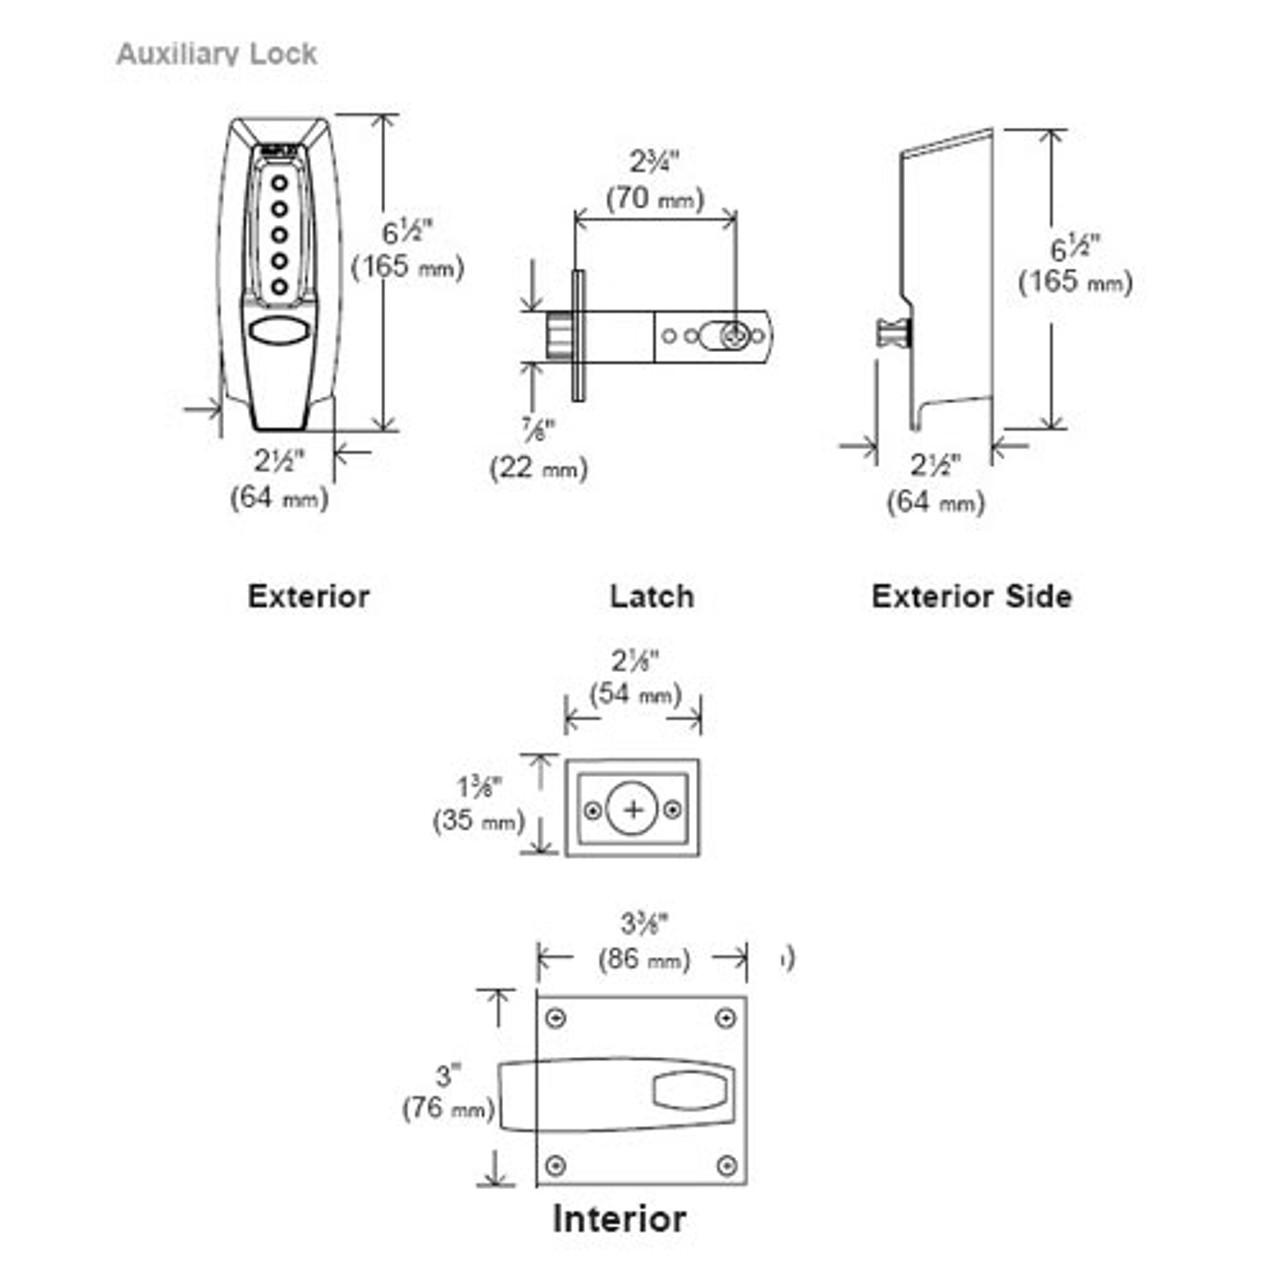 hight resolution of 7106 19 41 simplex pushbutton keyless latch lock in black lock simplex lock diagram source